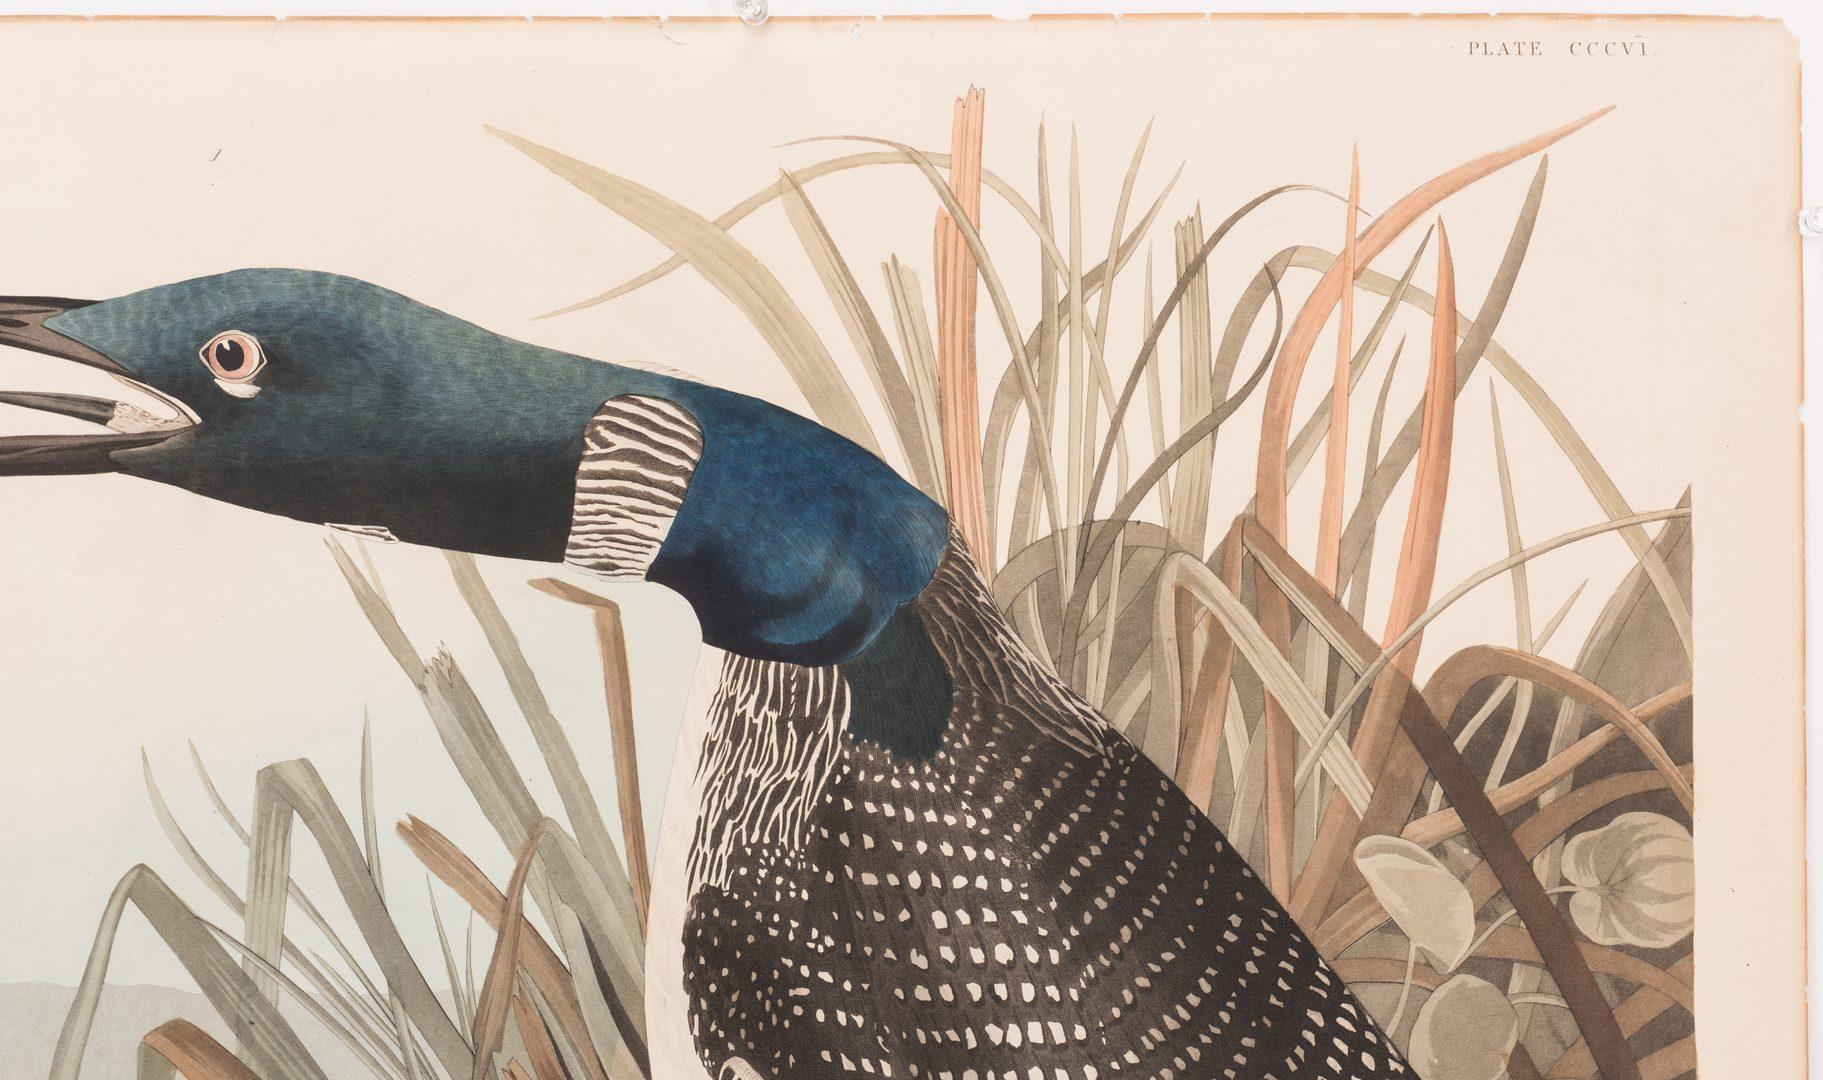 Lot 452: J.J. Audubon, Great Northern Diver or Loon